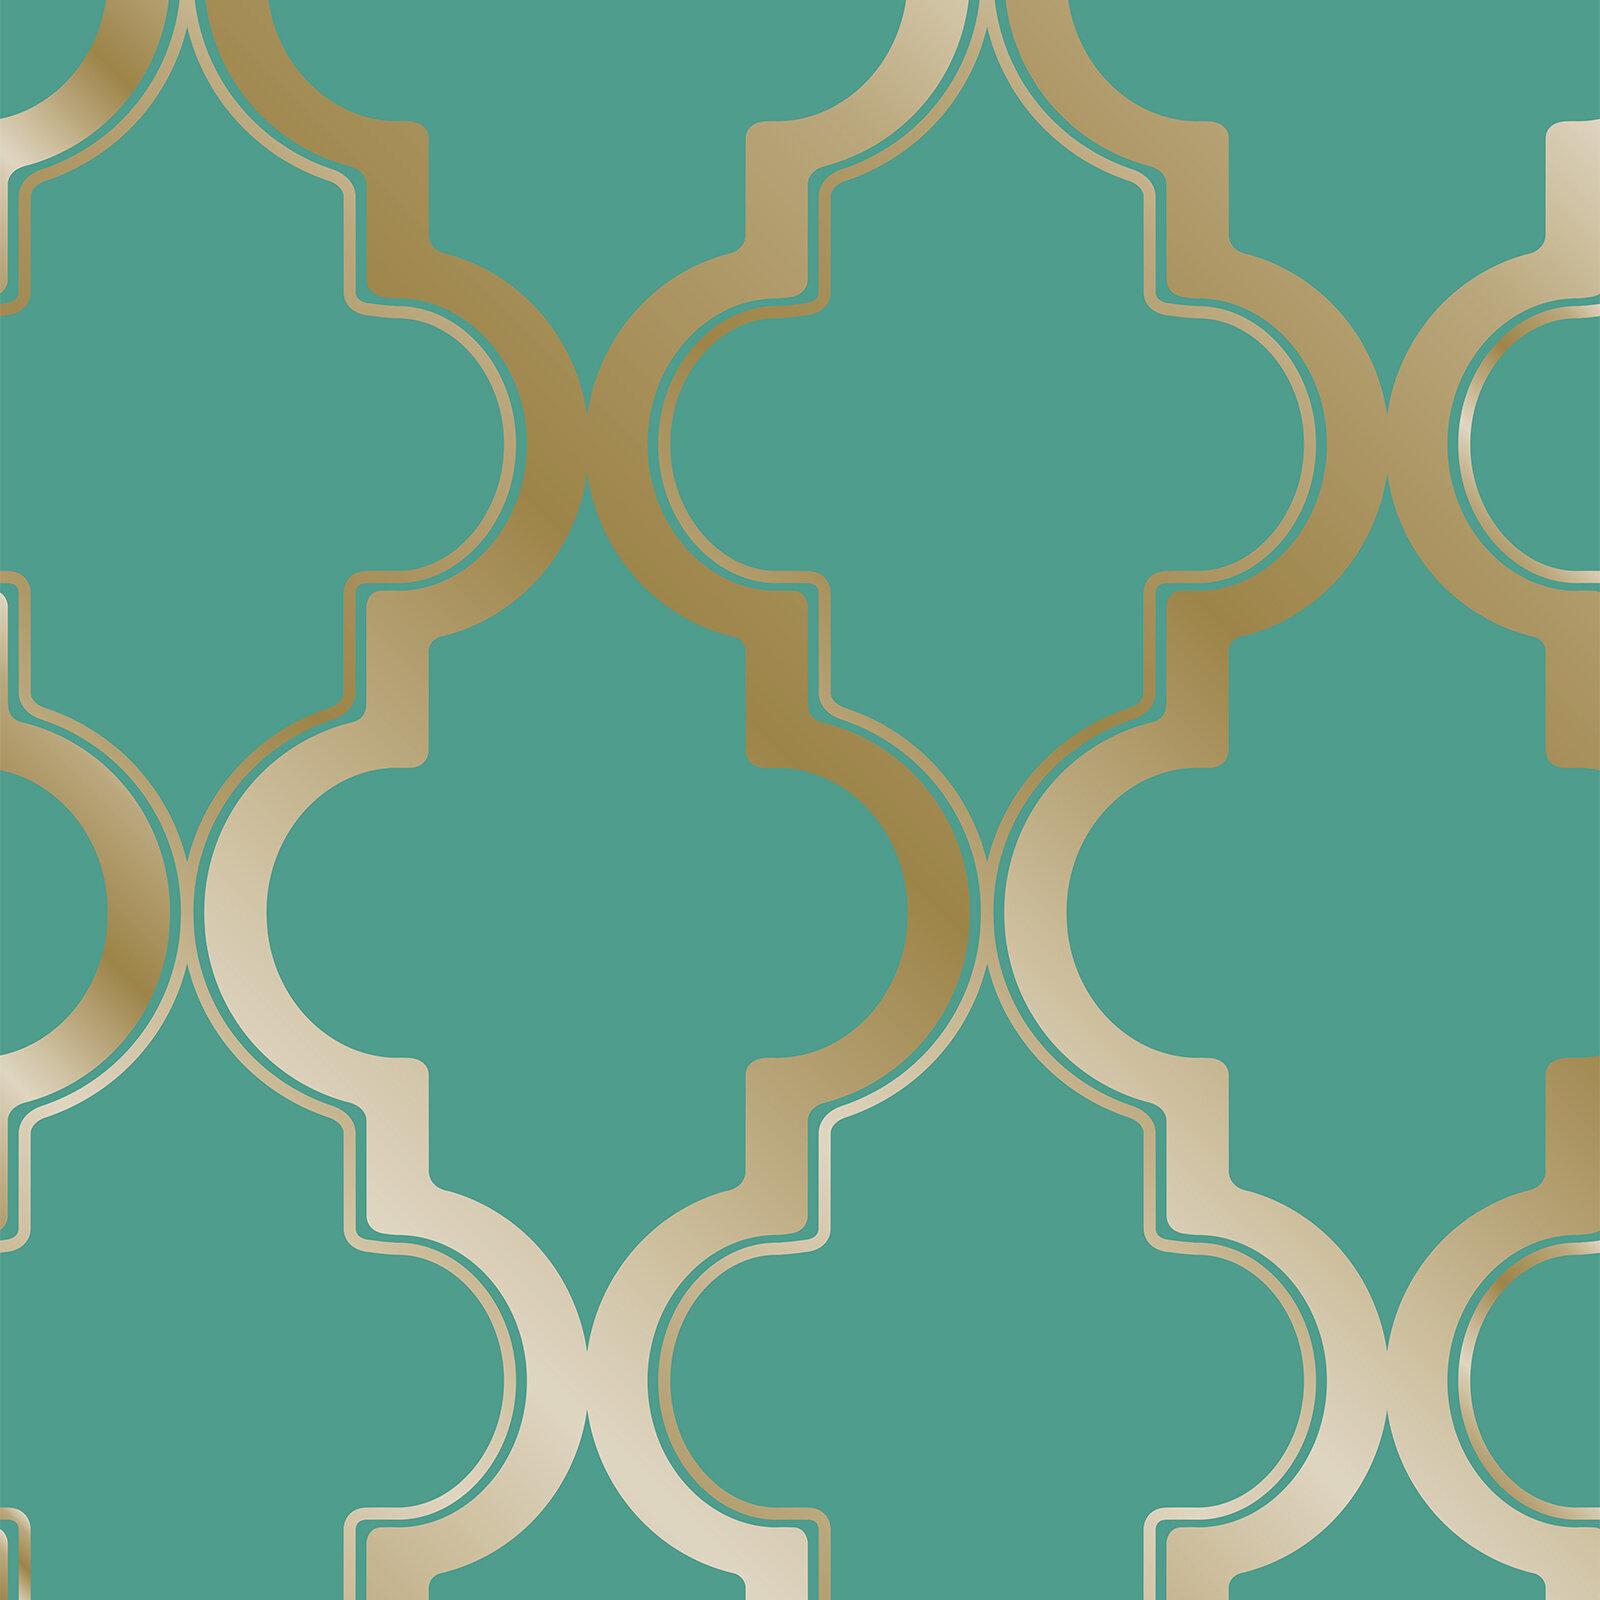 Tempaper TempaperR Marrakesh 33 X 205 Peel And Stick Wallpaper Roll Reviews